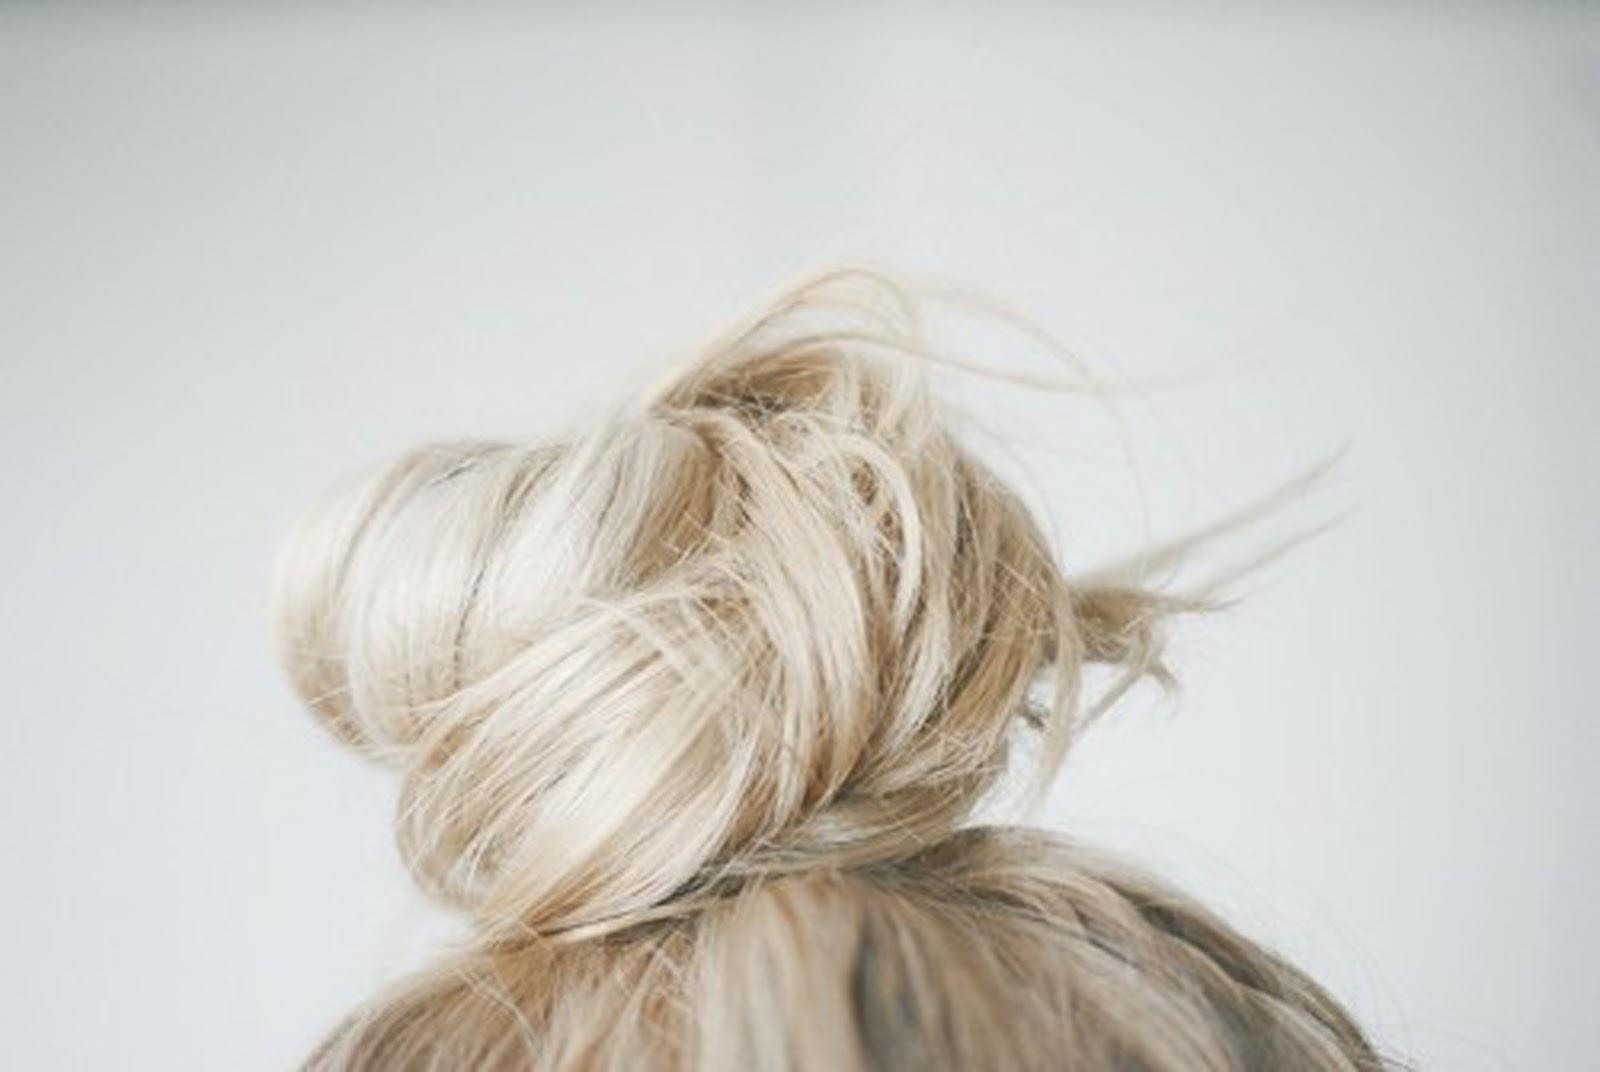 Messy hair bunTumblr Messy Hair Bun